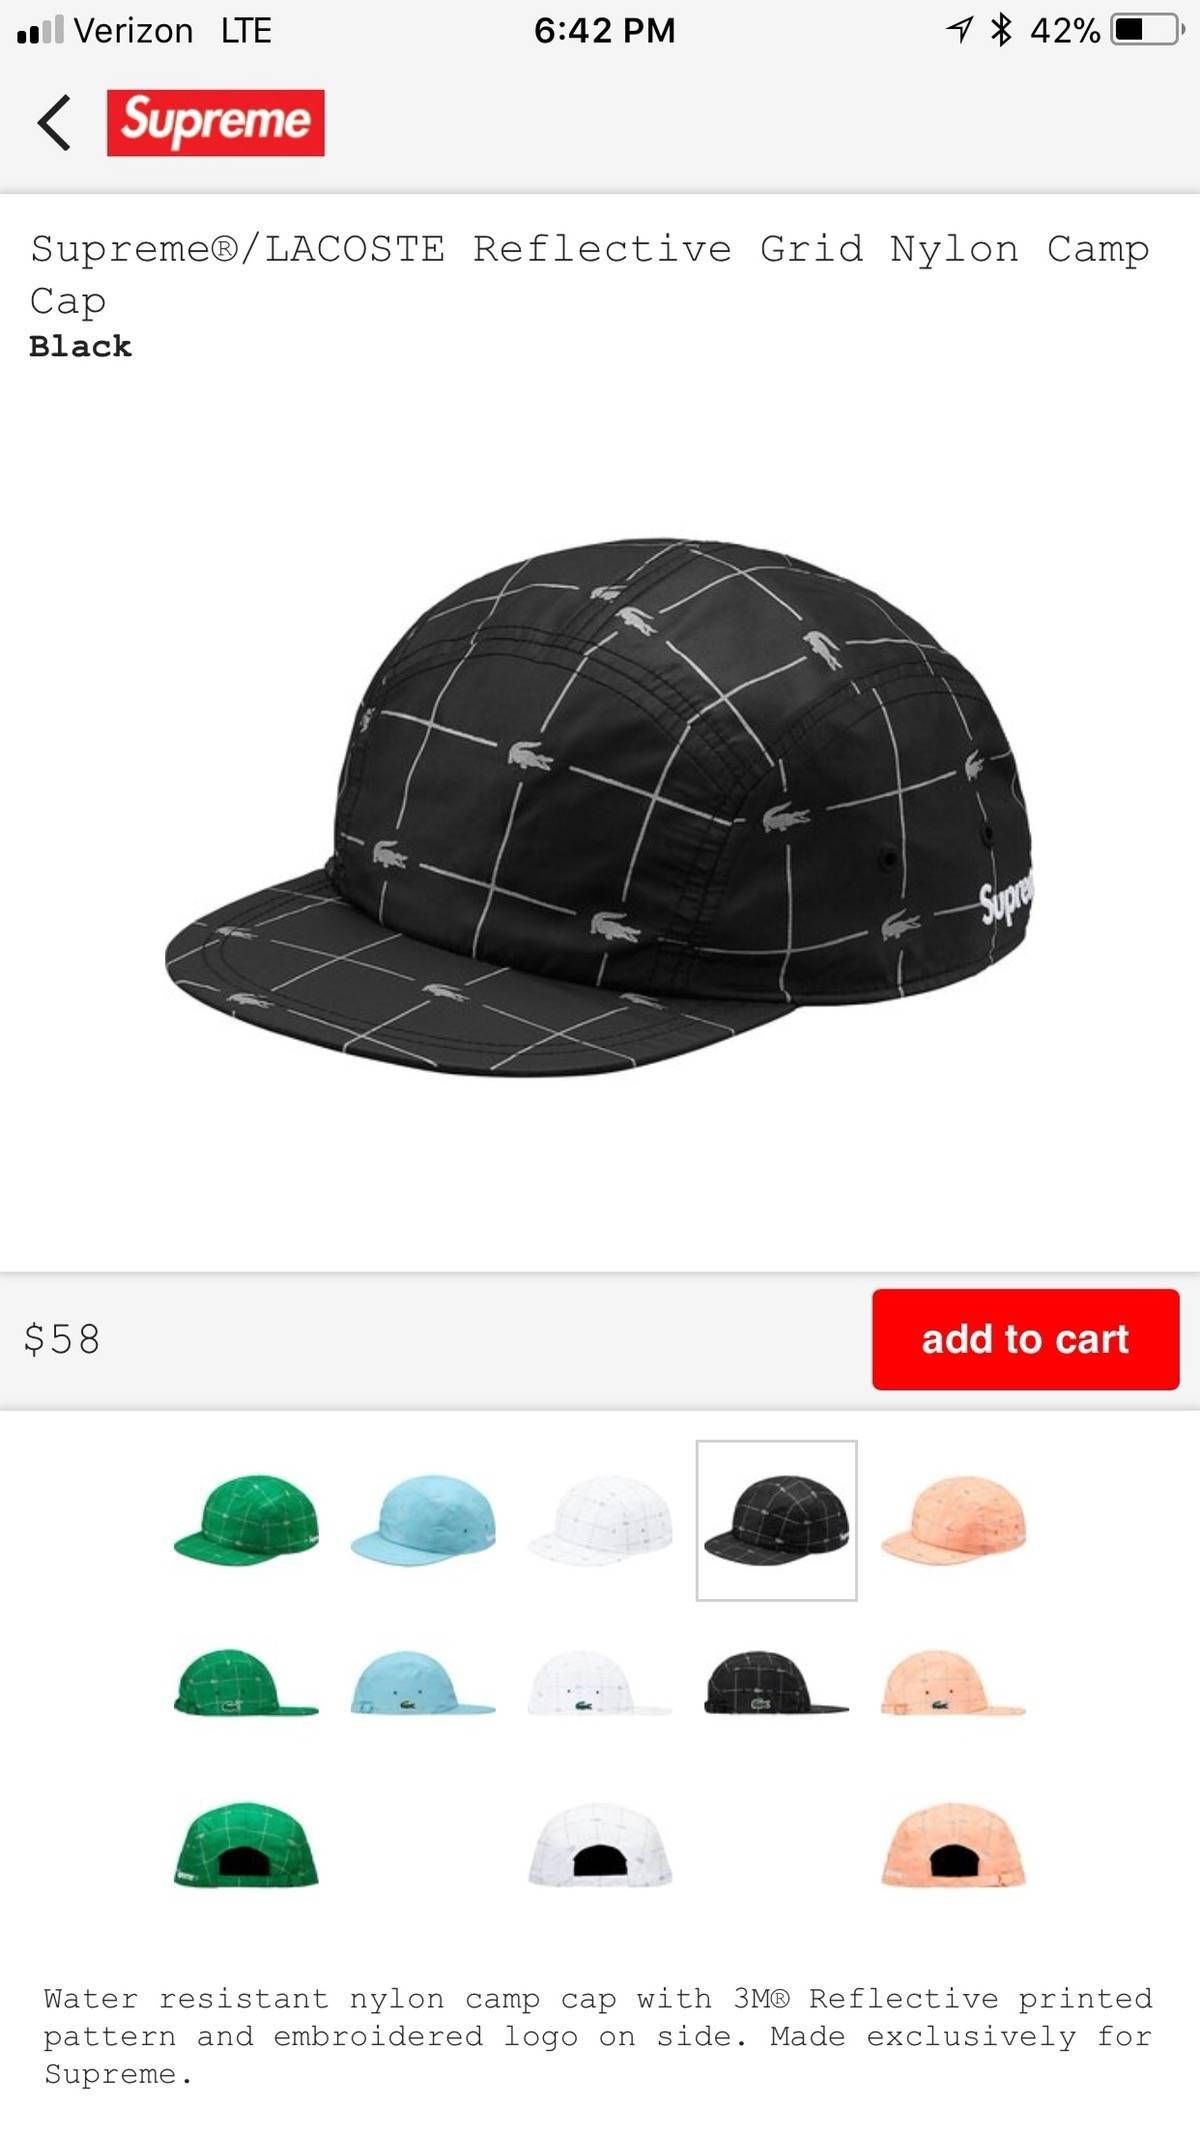 4a8af78f9ca ... ebay supreme supreme lacoste reflective grid nylon camp cap black size  one size hats for sale